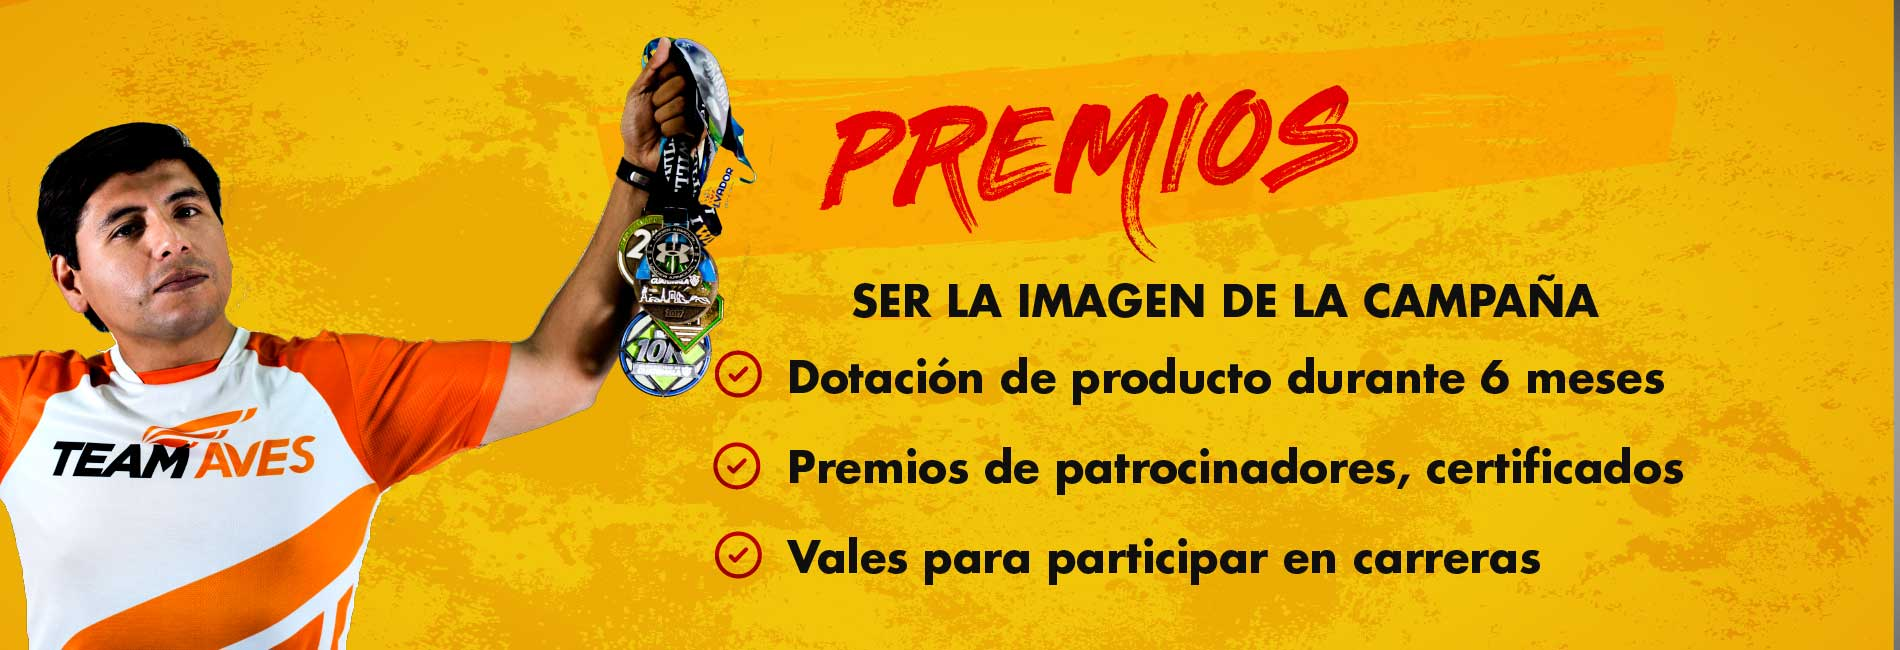 banner3-premios